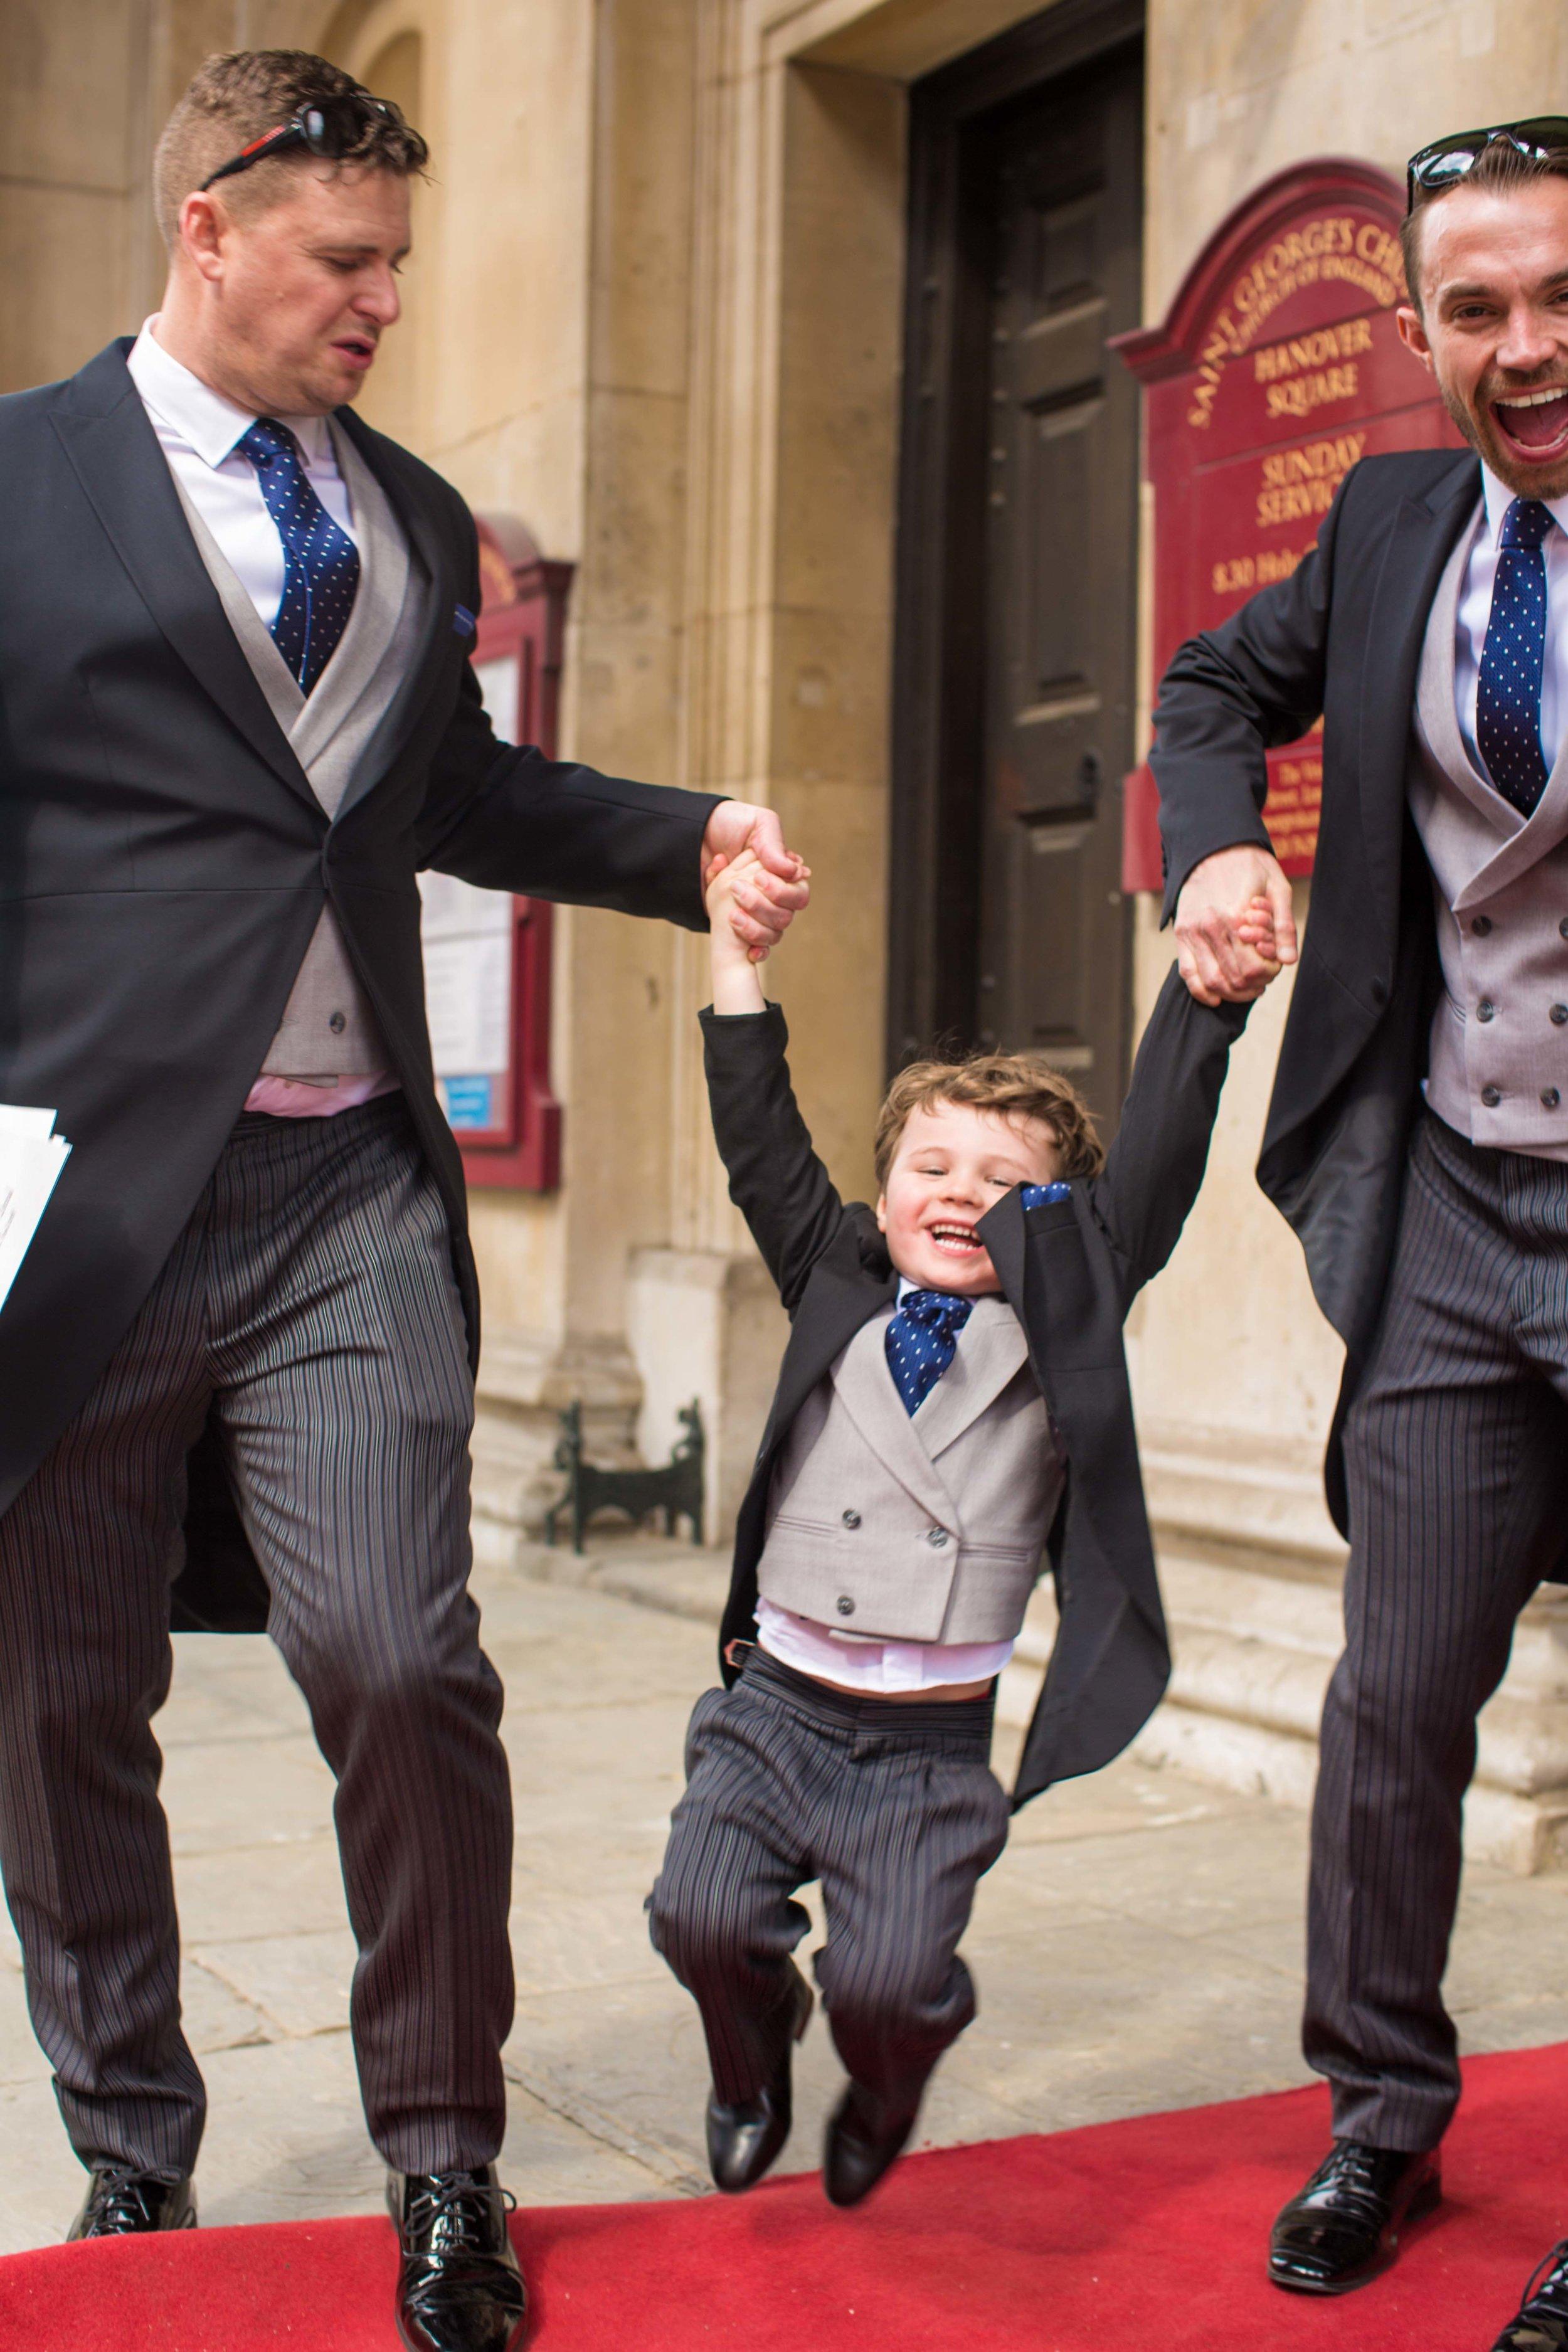 claridges-hotel-wedding-photographer-london-mayfair-natalia-smith-photography-50.jpg